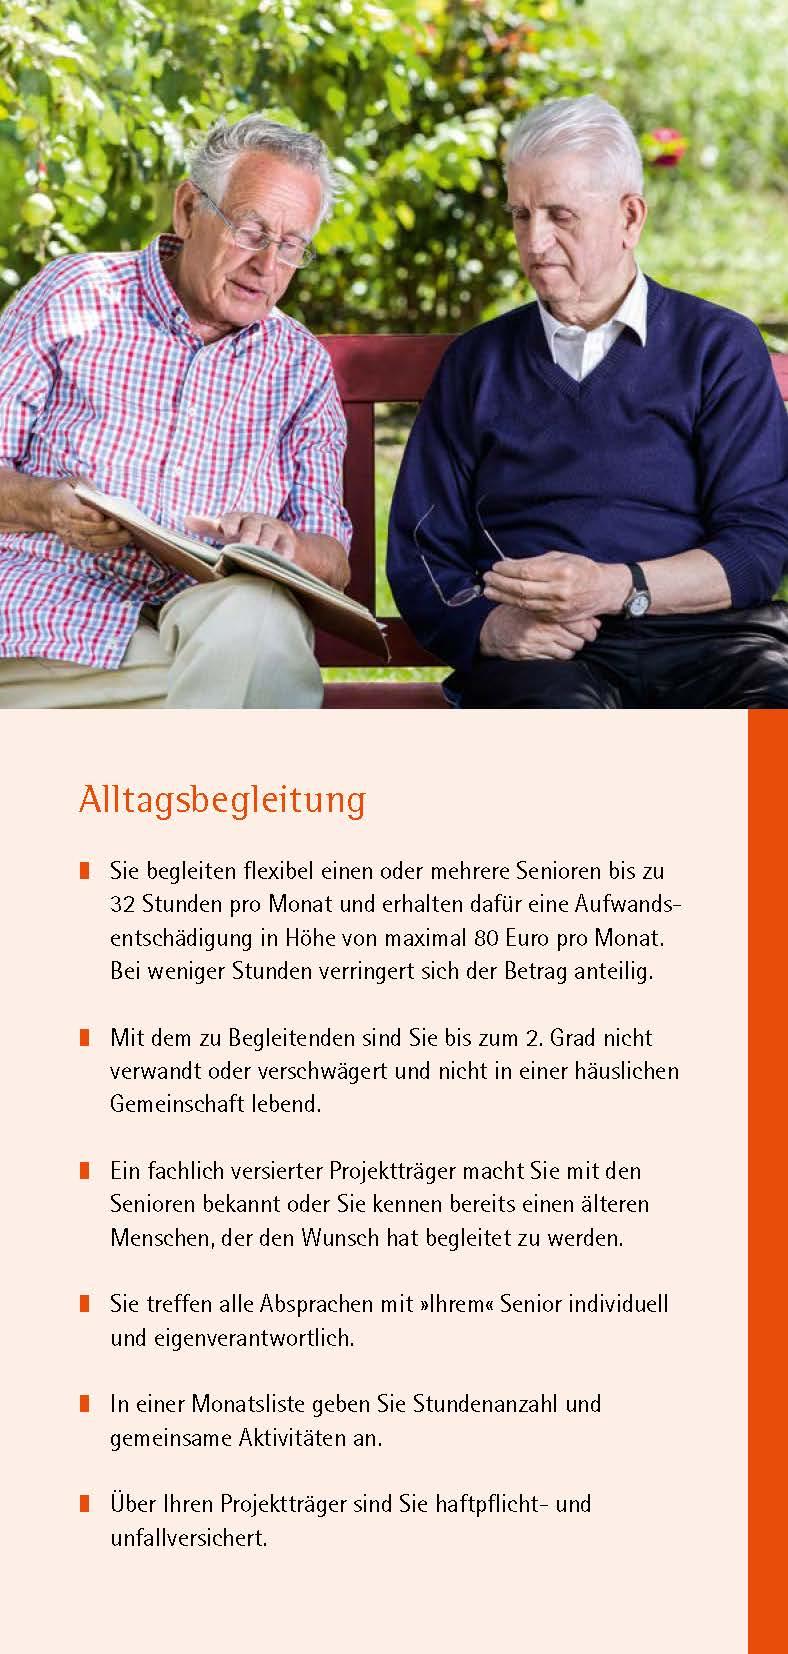 2019_FSS_FB_Nachbarschaftshilfe-Alltagsbegleitung_PDF-UA_Seite_2.jpg